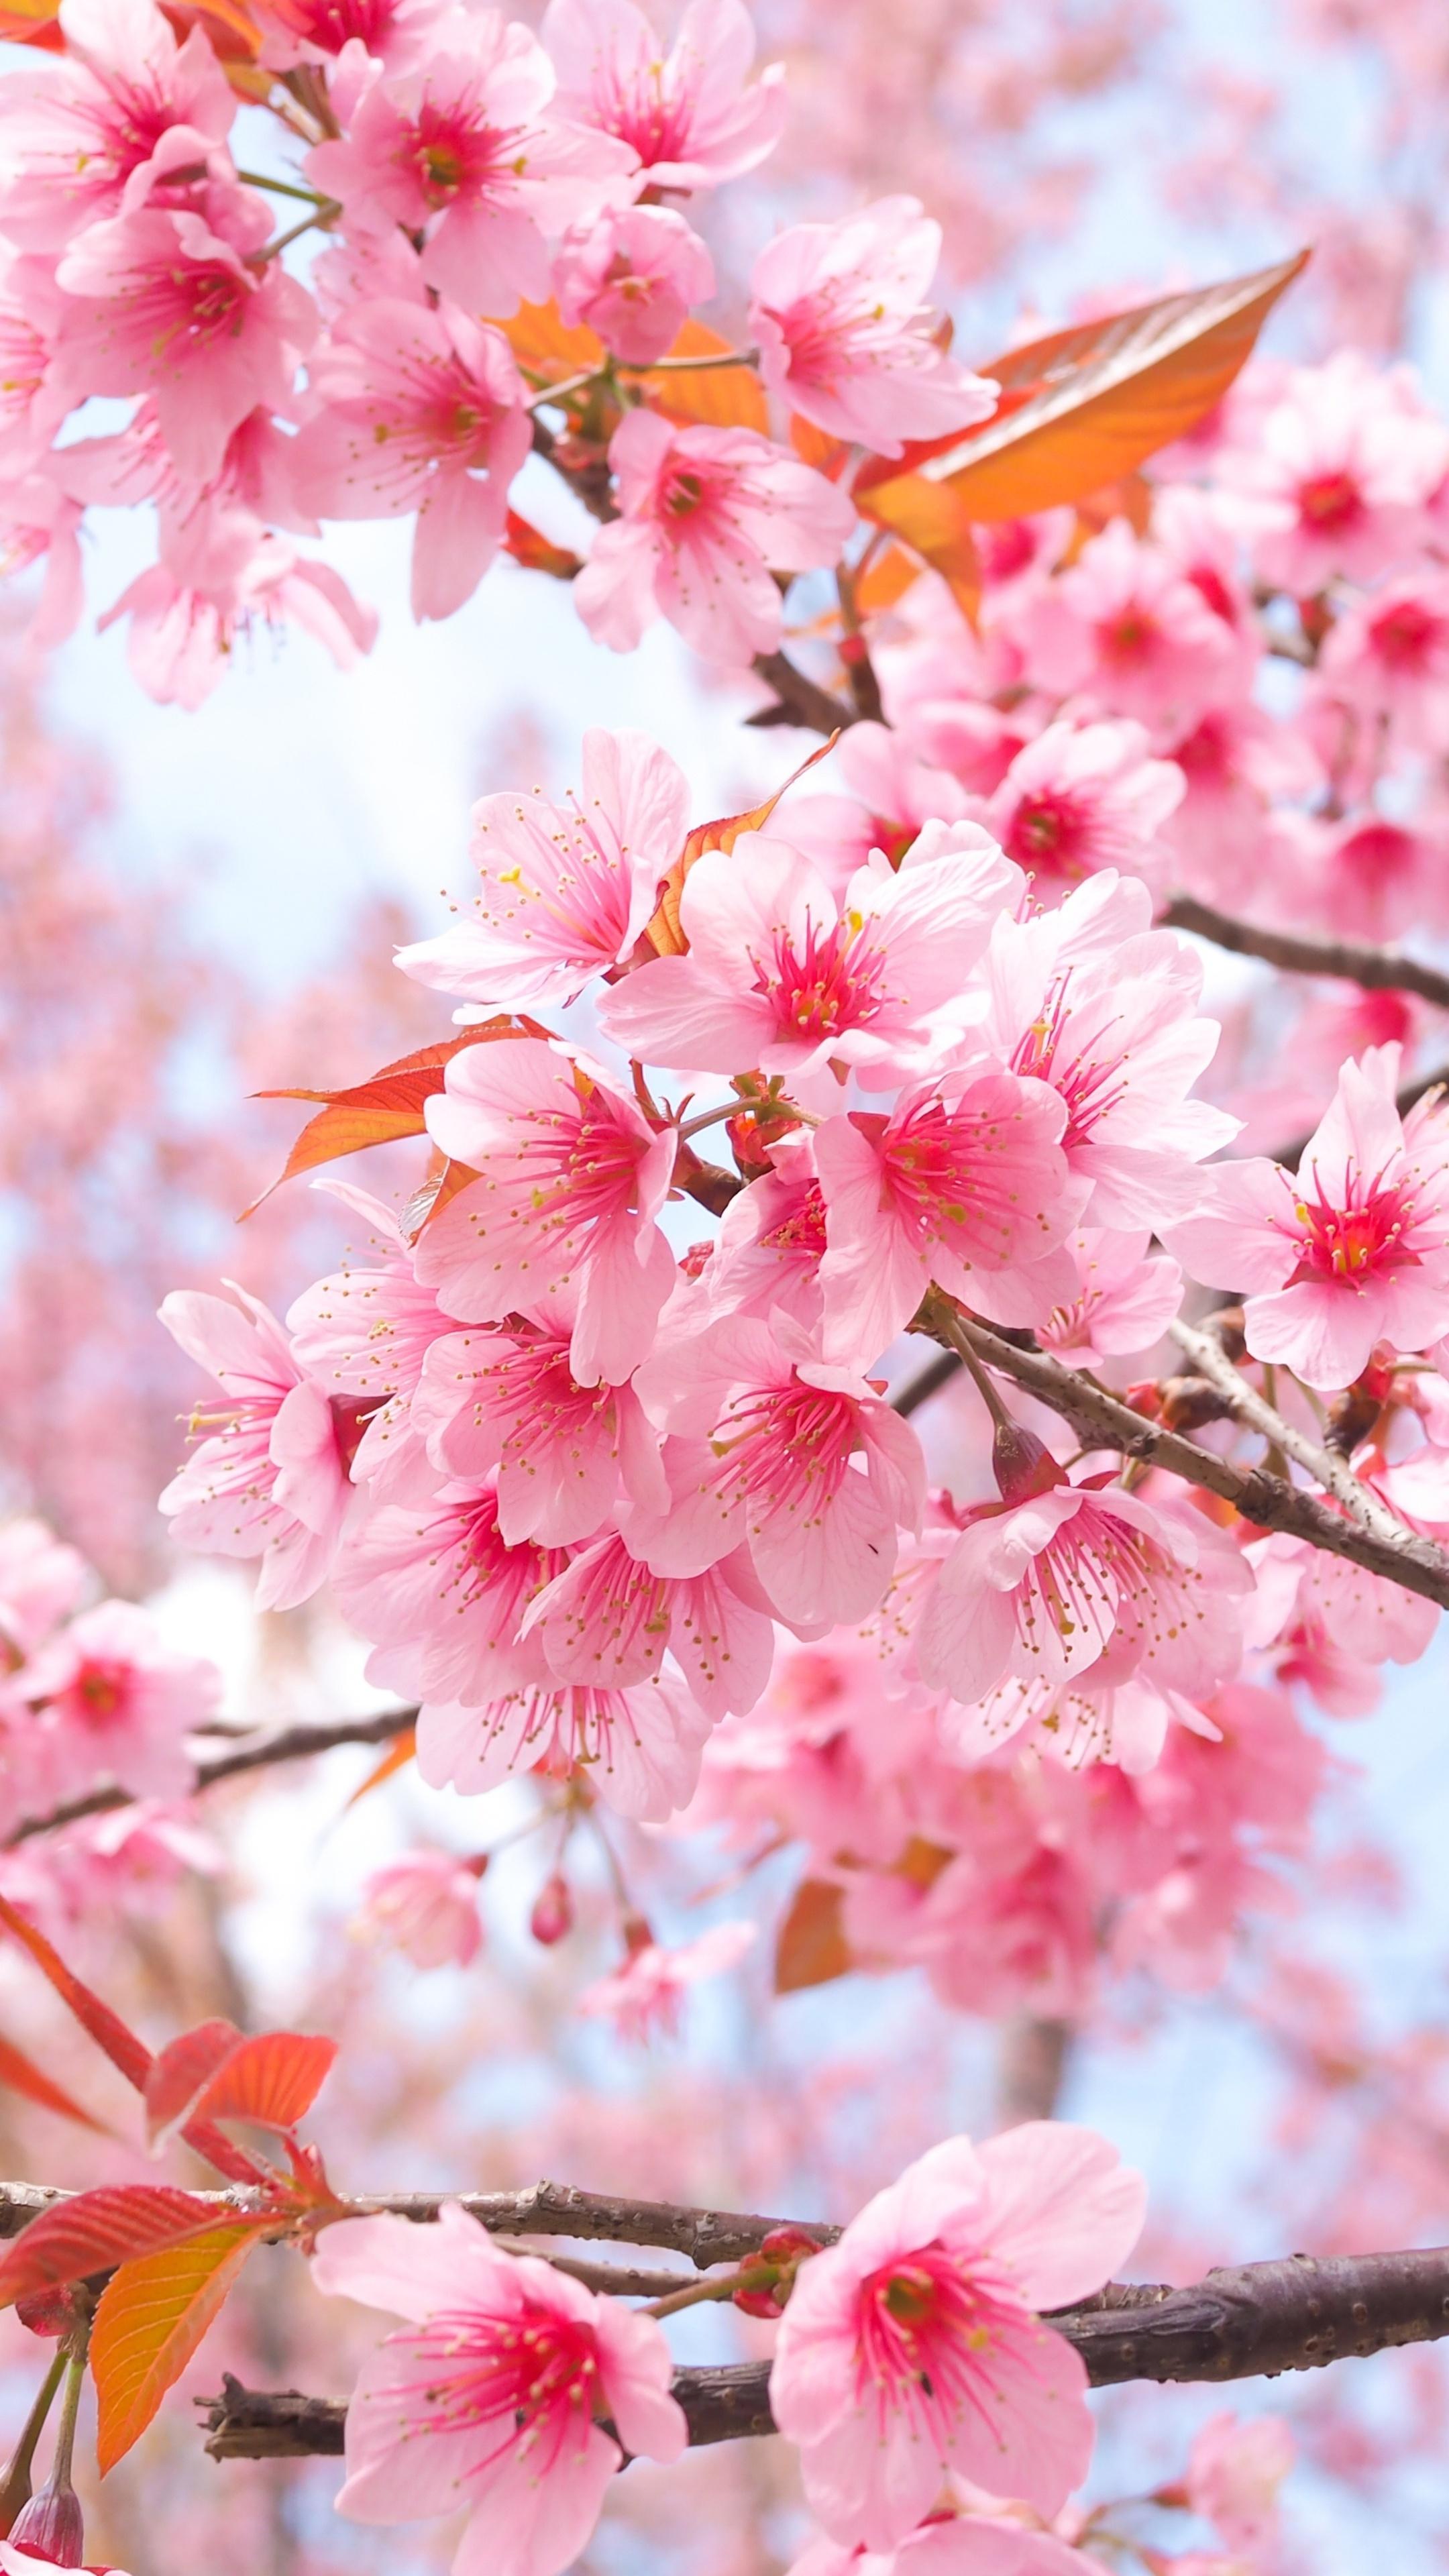 2160x3840 Cherry Blossom Tree Branches 4k Sony Xperia X,XZ ...